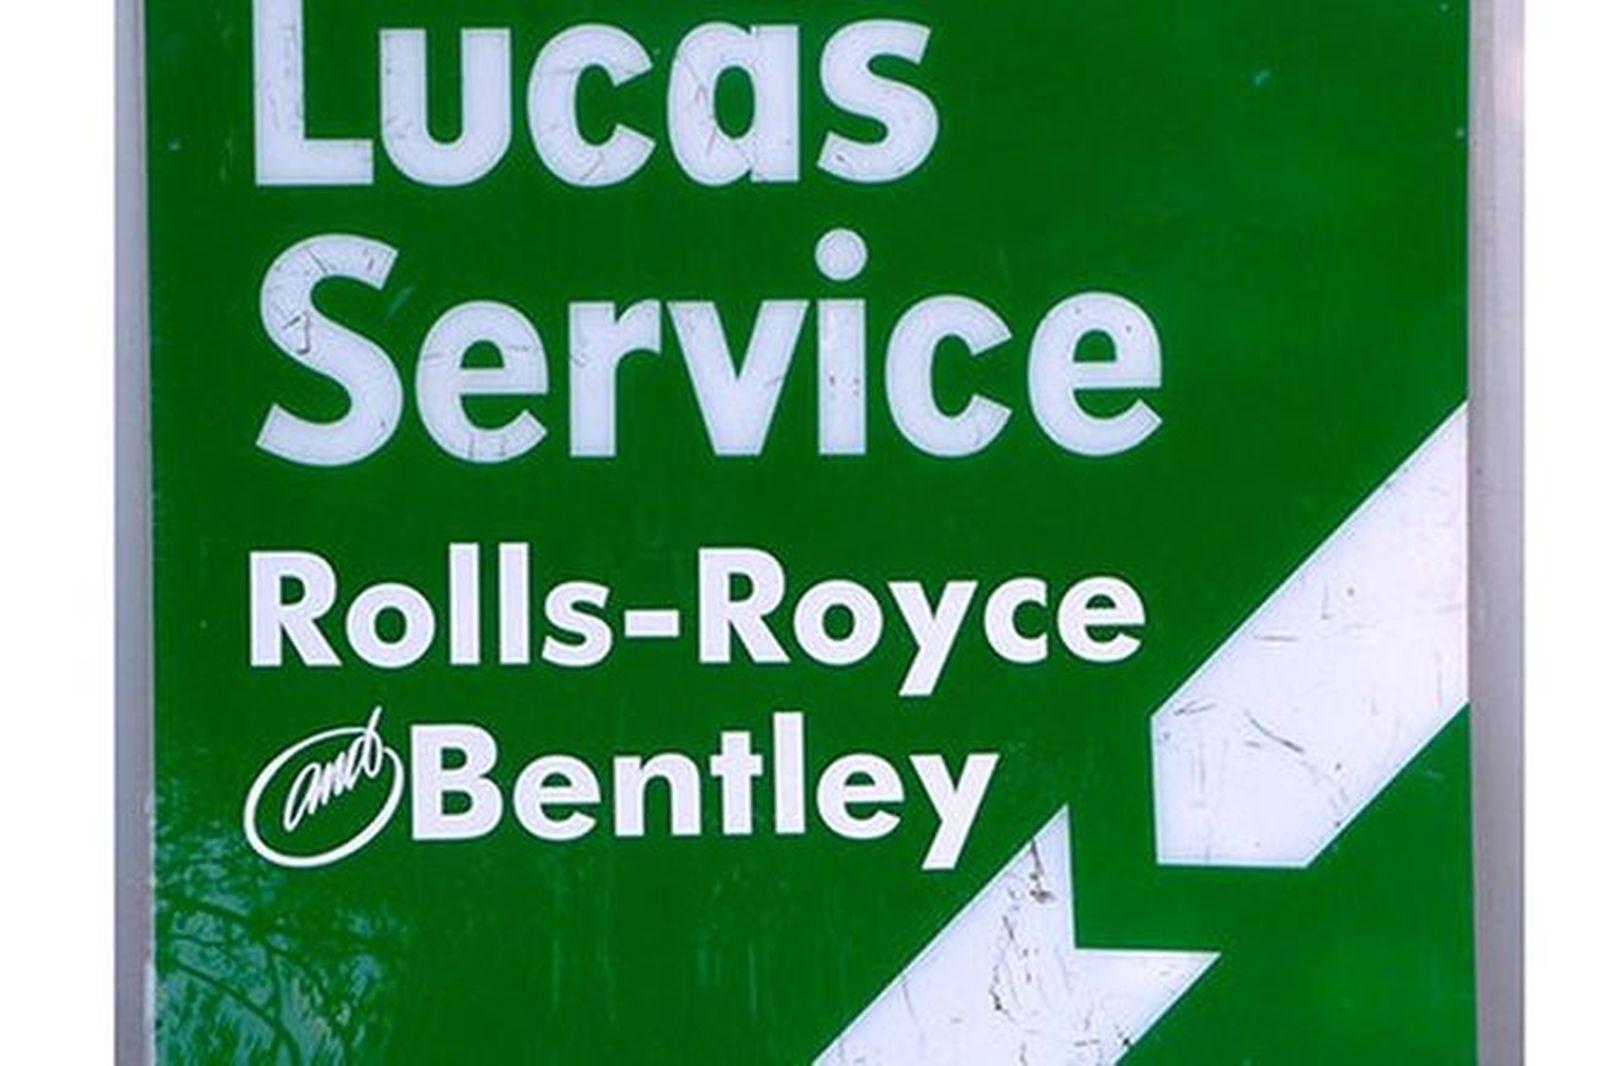 Perspex Signs x 2 - Lucas Service (120 x 120cm)